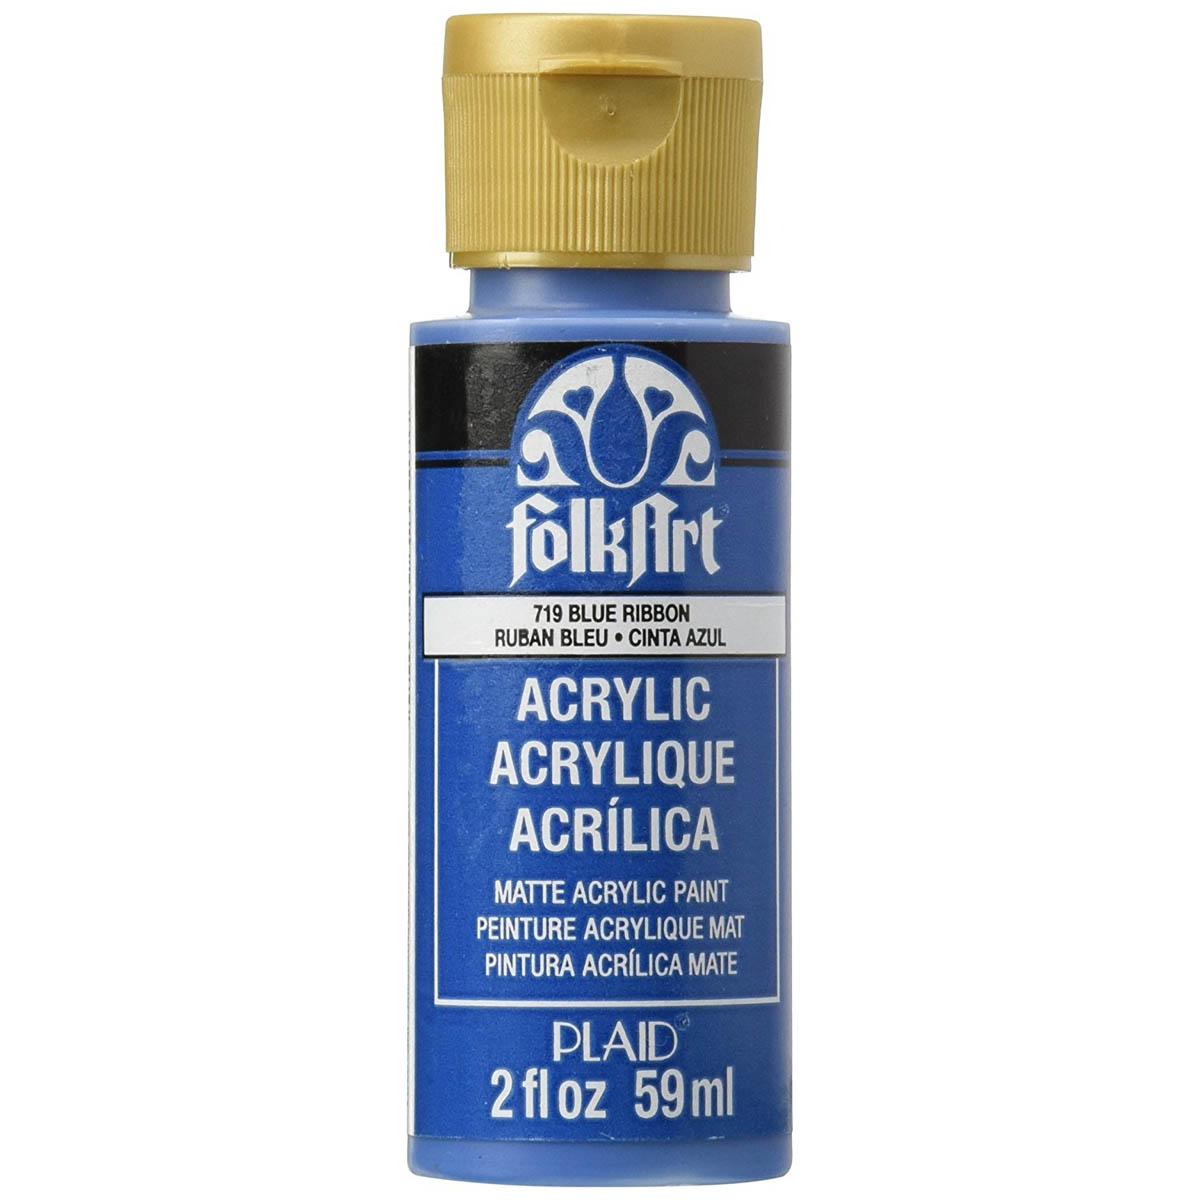 FolkArt ® Acrylic Colors - Blue Ribbon, 2 oz.